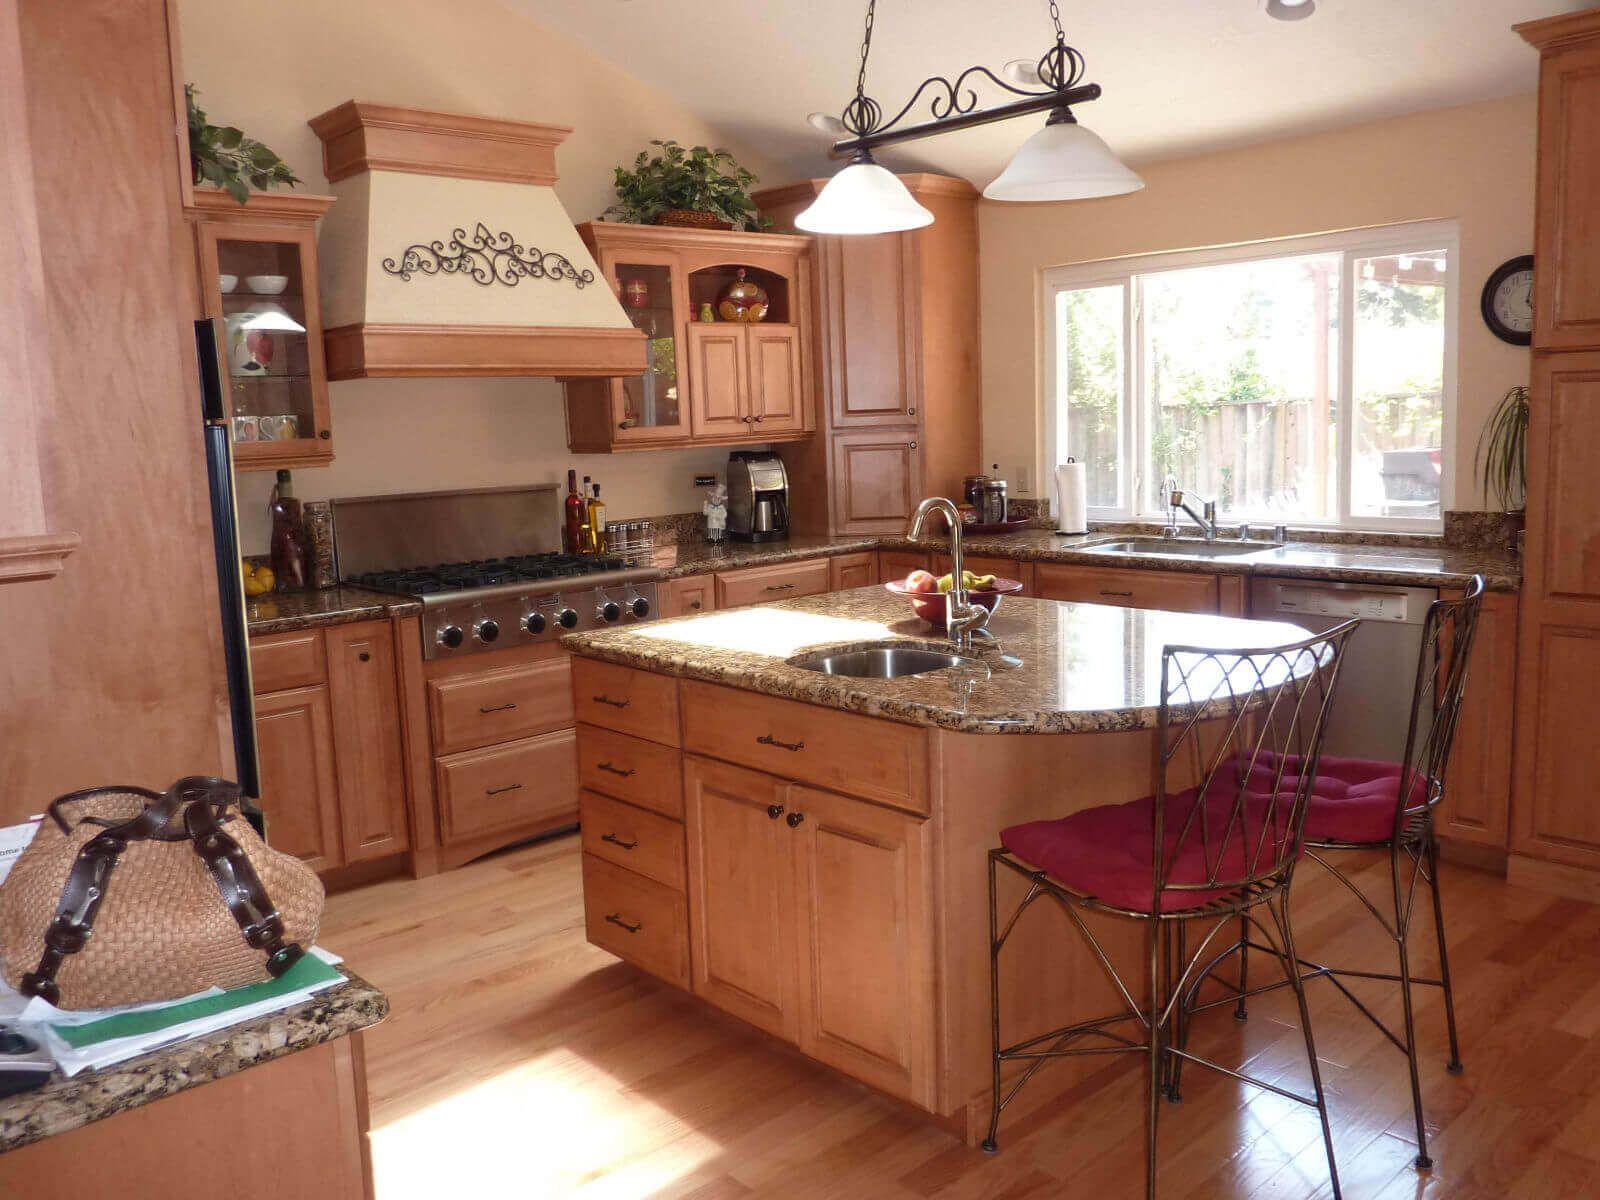 68 Deluxe Custom Kitchen Island Ideas Jaw Dropping Designs Kitchen Design Small Round Kitchen Island Kitchen Island Design